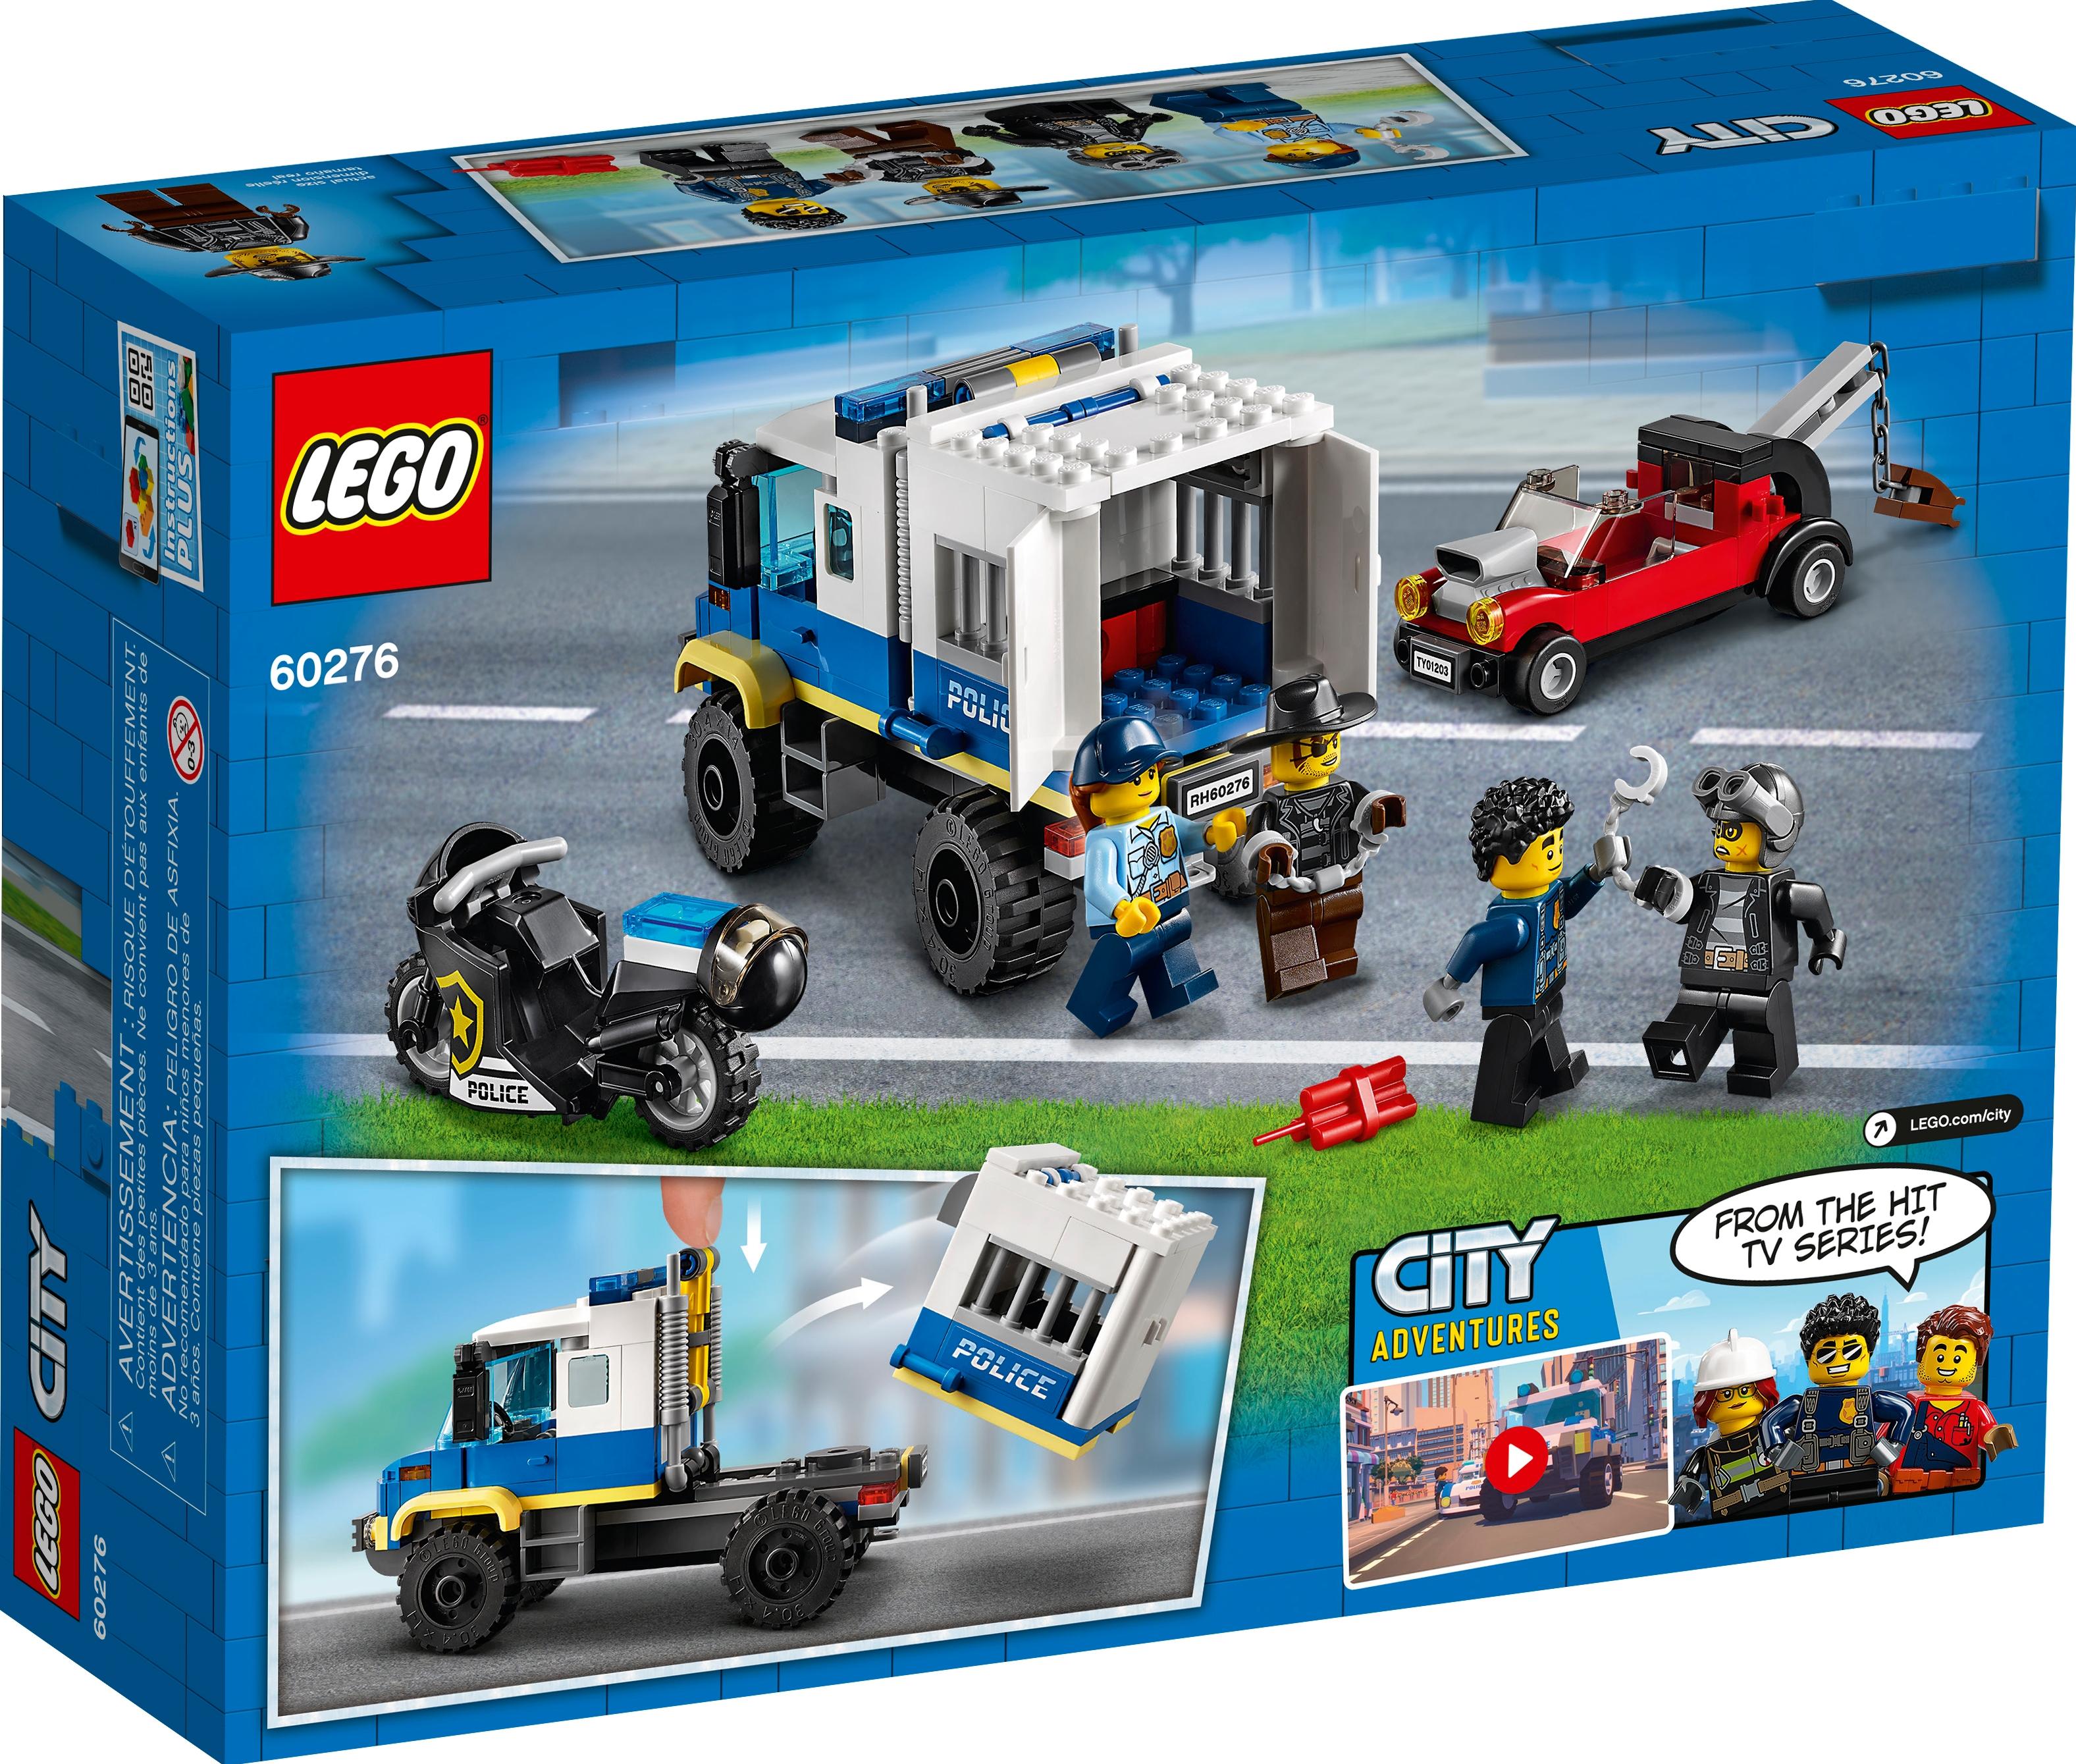 Police Prisoner Transport